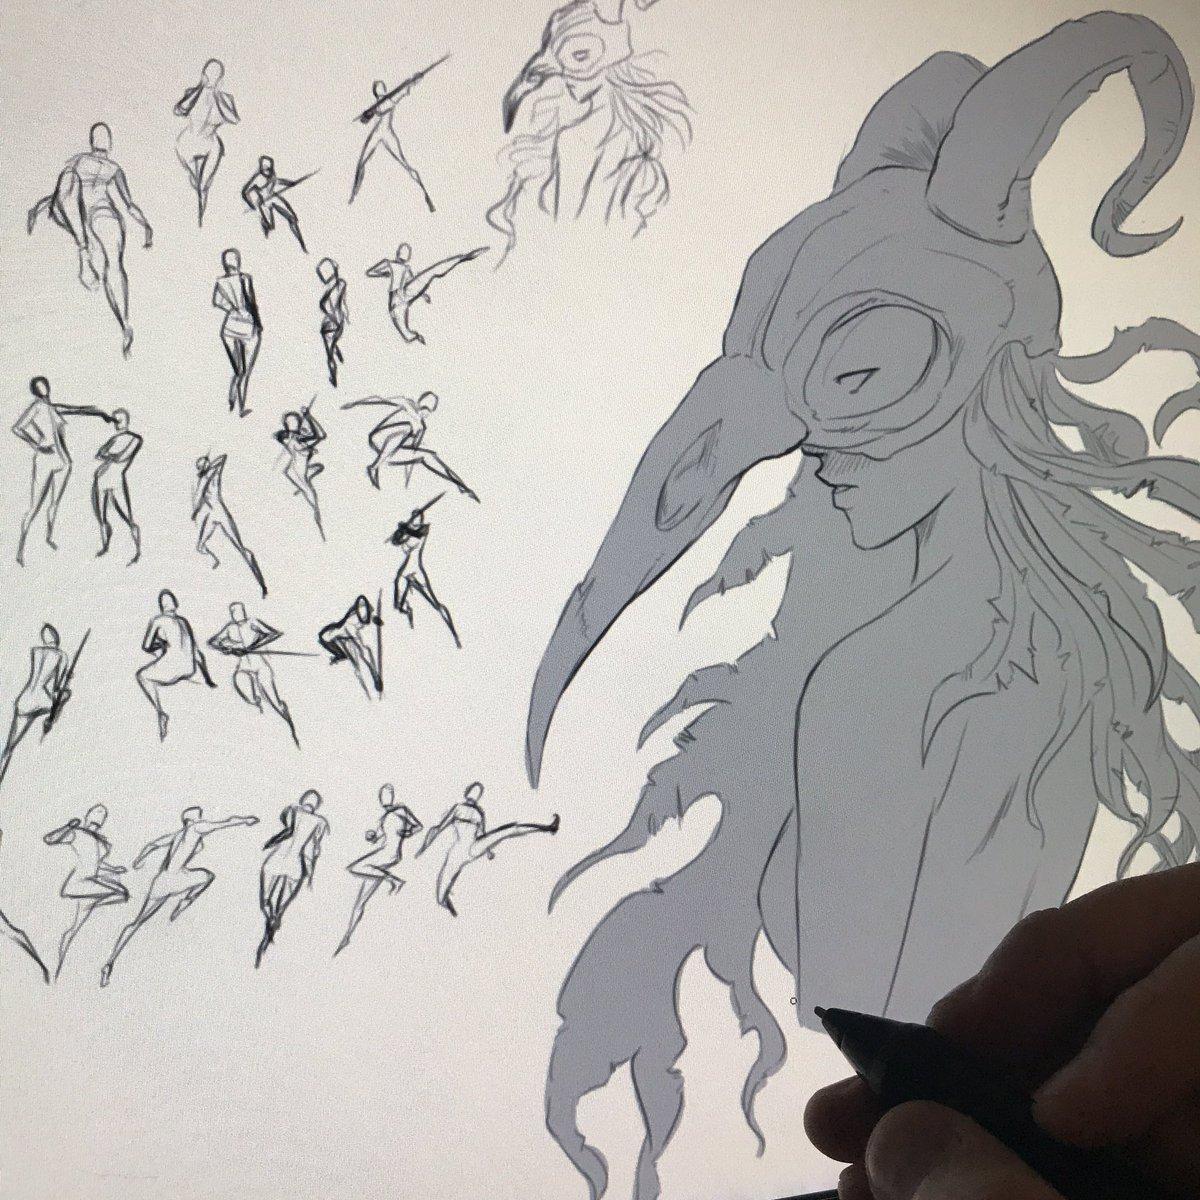 Danhowardart On Twitter Some Sketch Pages Art Drawing Skull Samurai Sword Gesture Pose